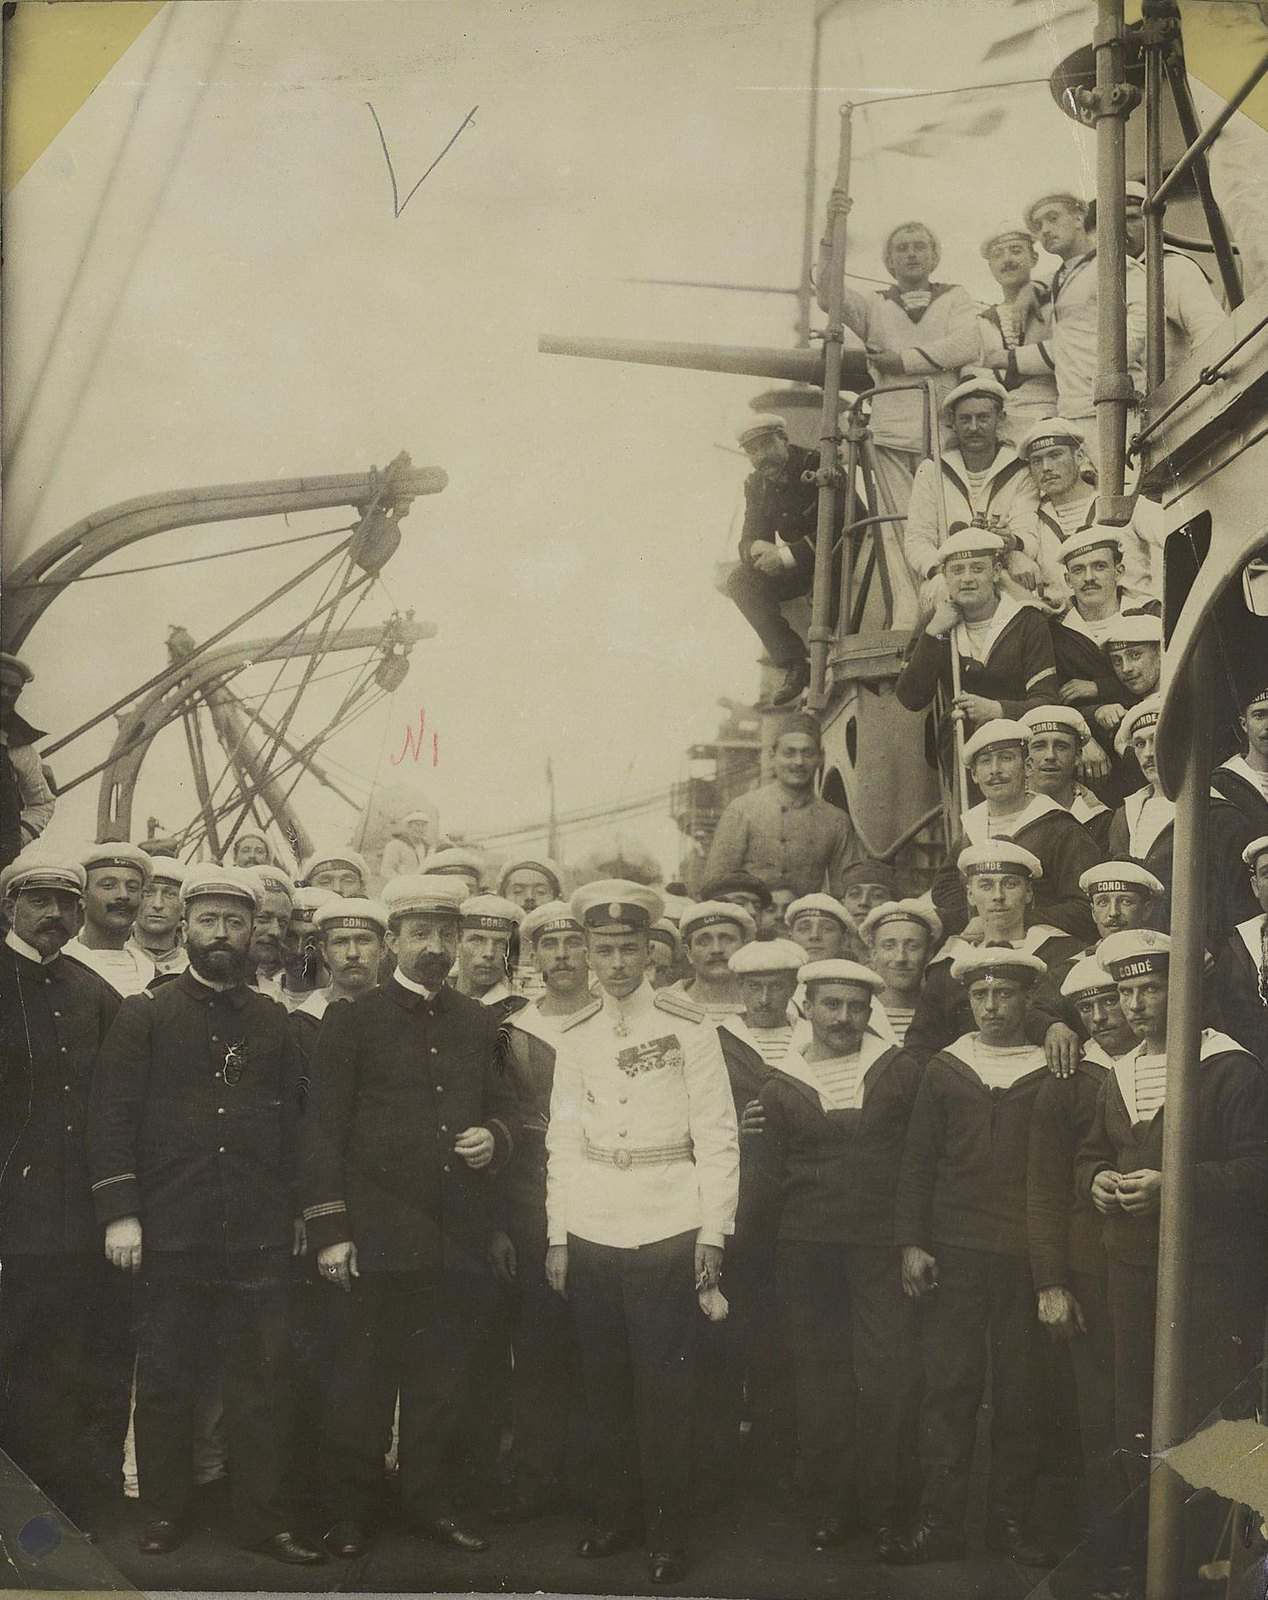 20. Команда корабля Conde 1901-1902 гг.